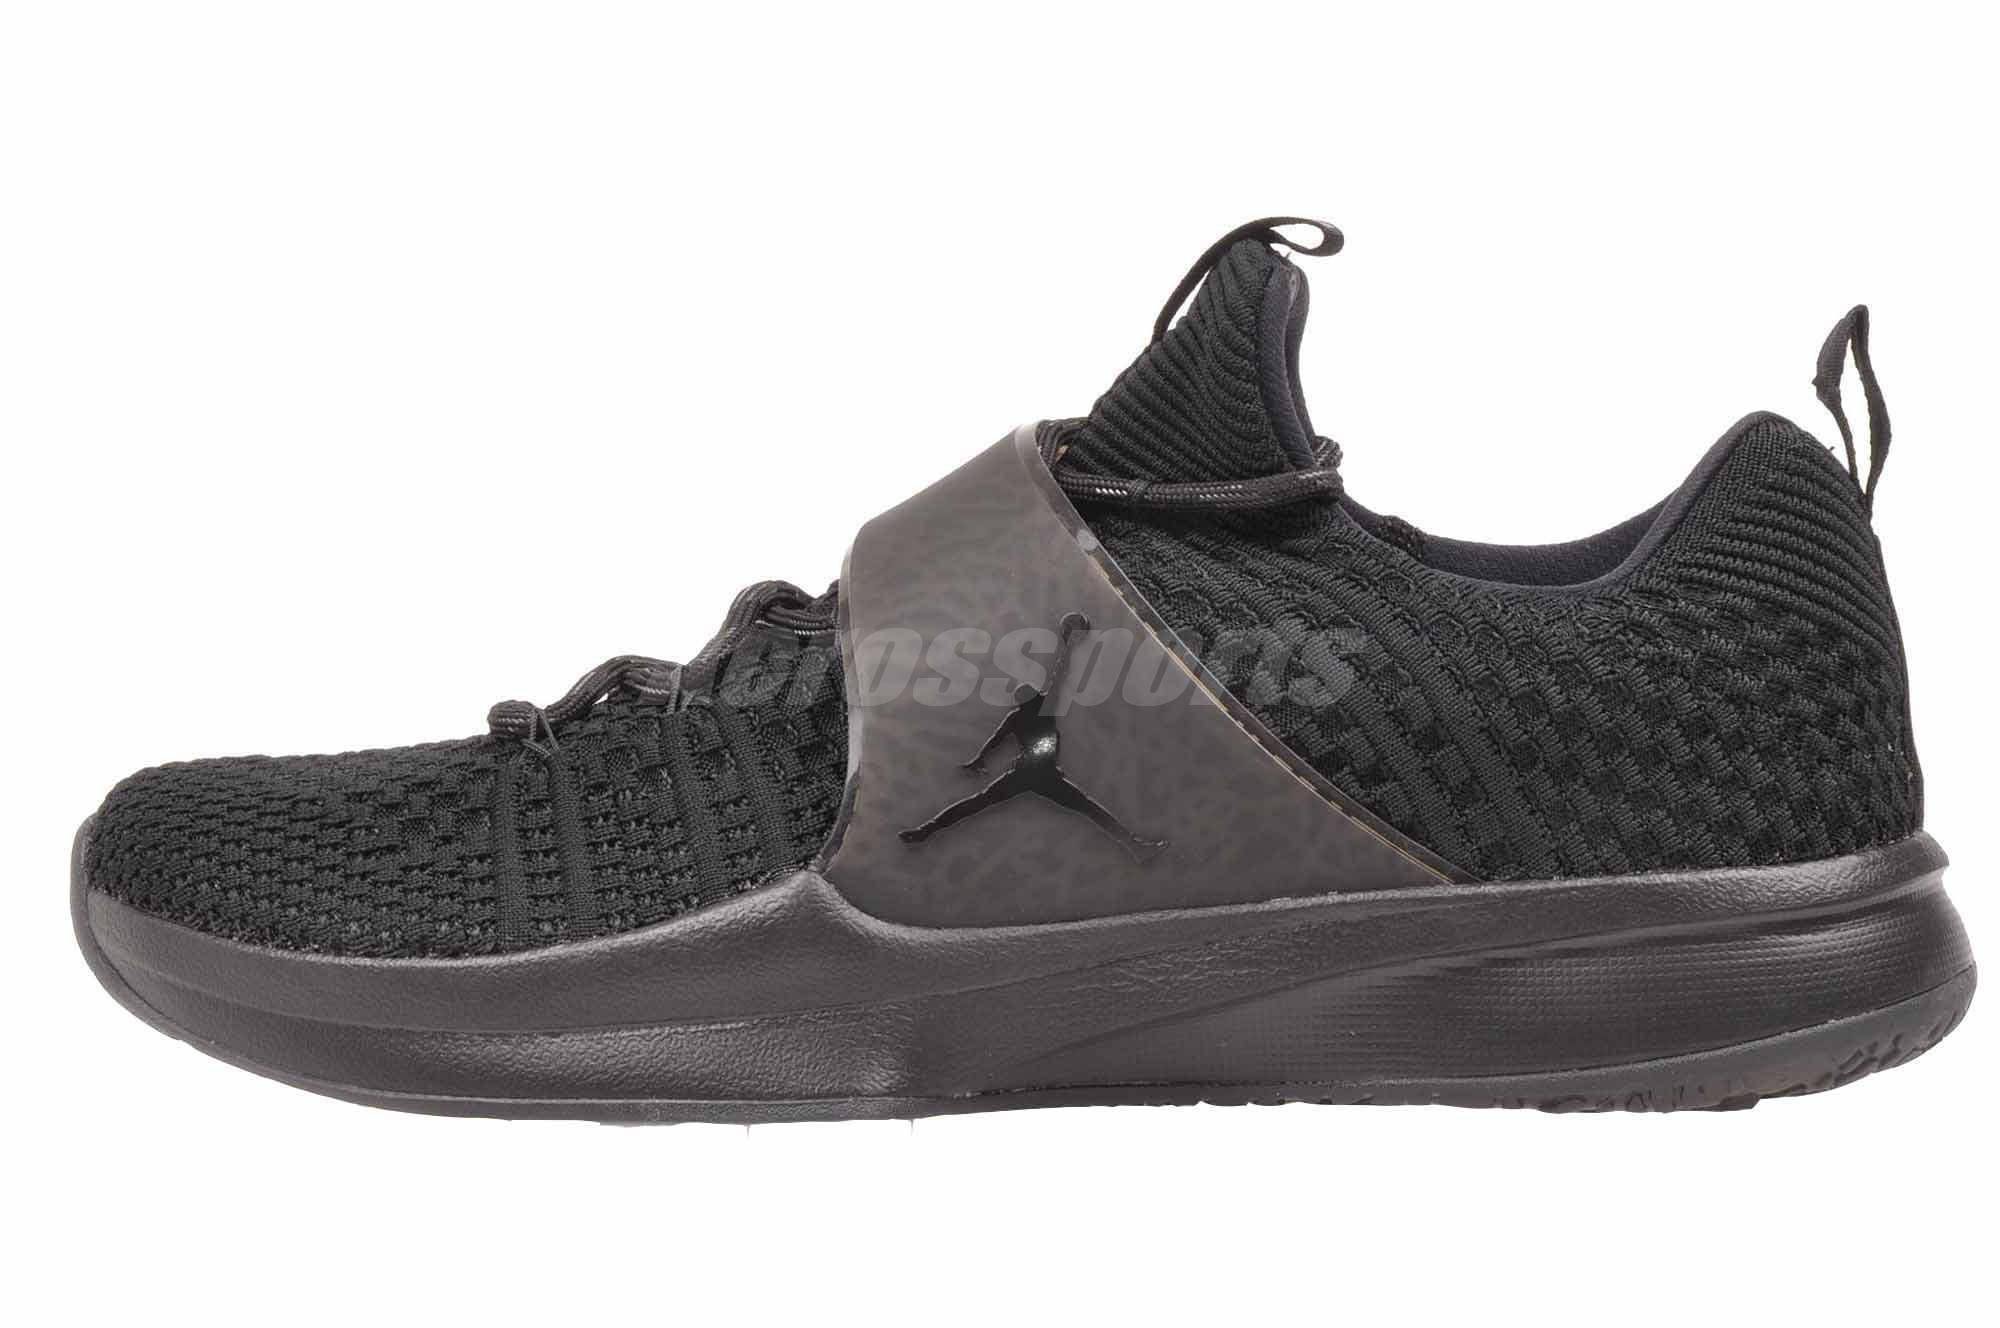 Nike Jordan Trainer 2 Flyknit Cross Training Mens Shoes Air Black 921210-013 1000ec3b670